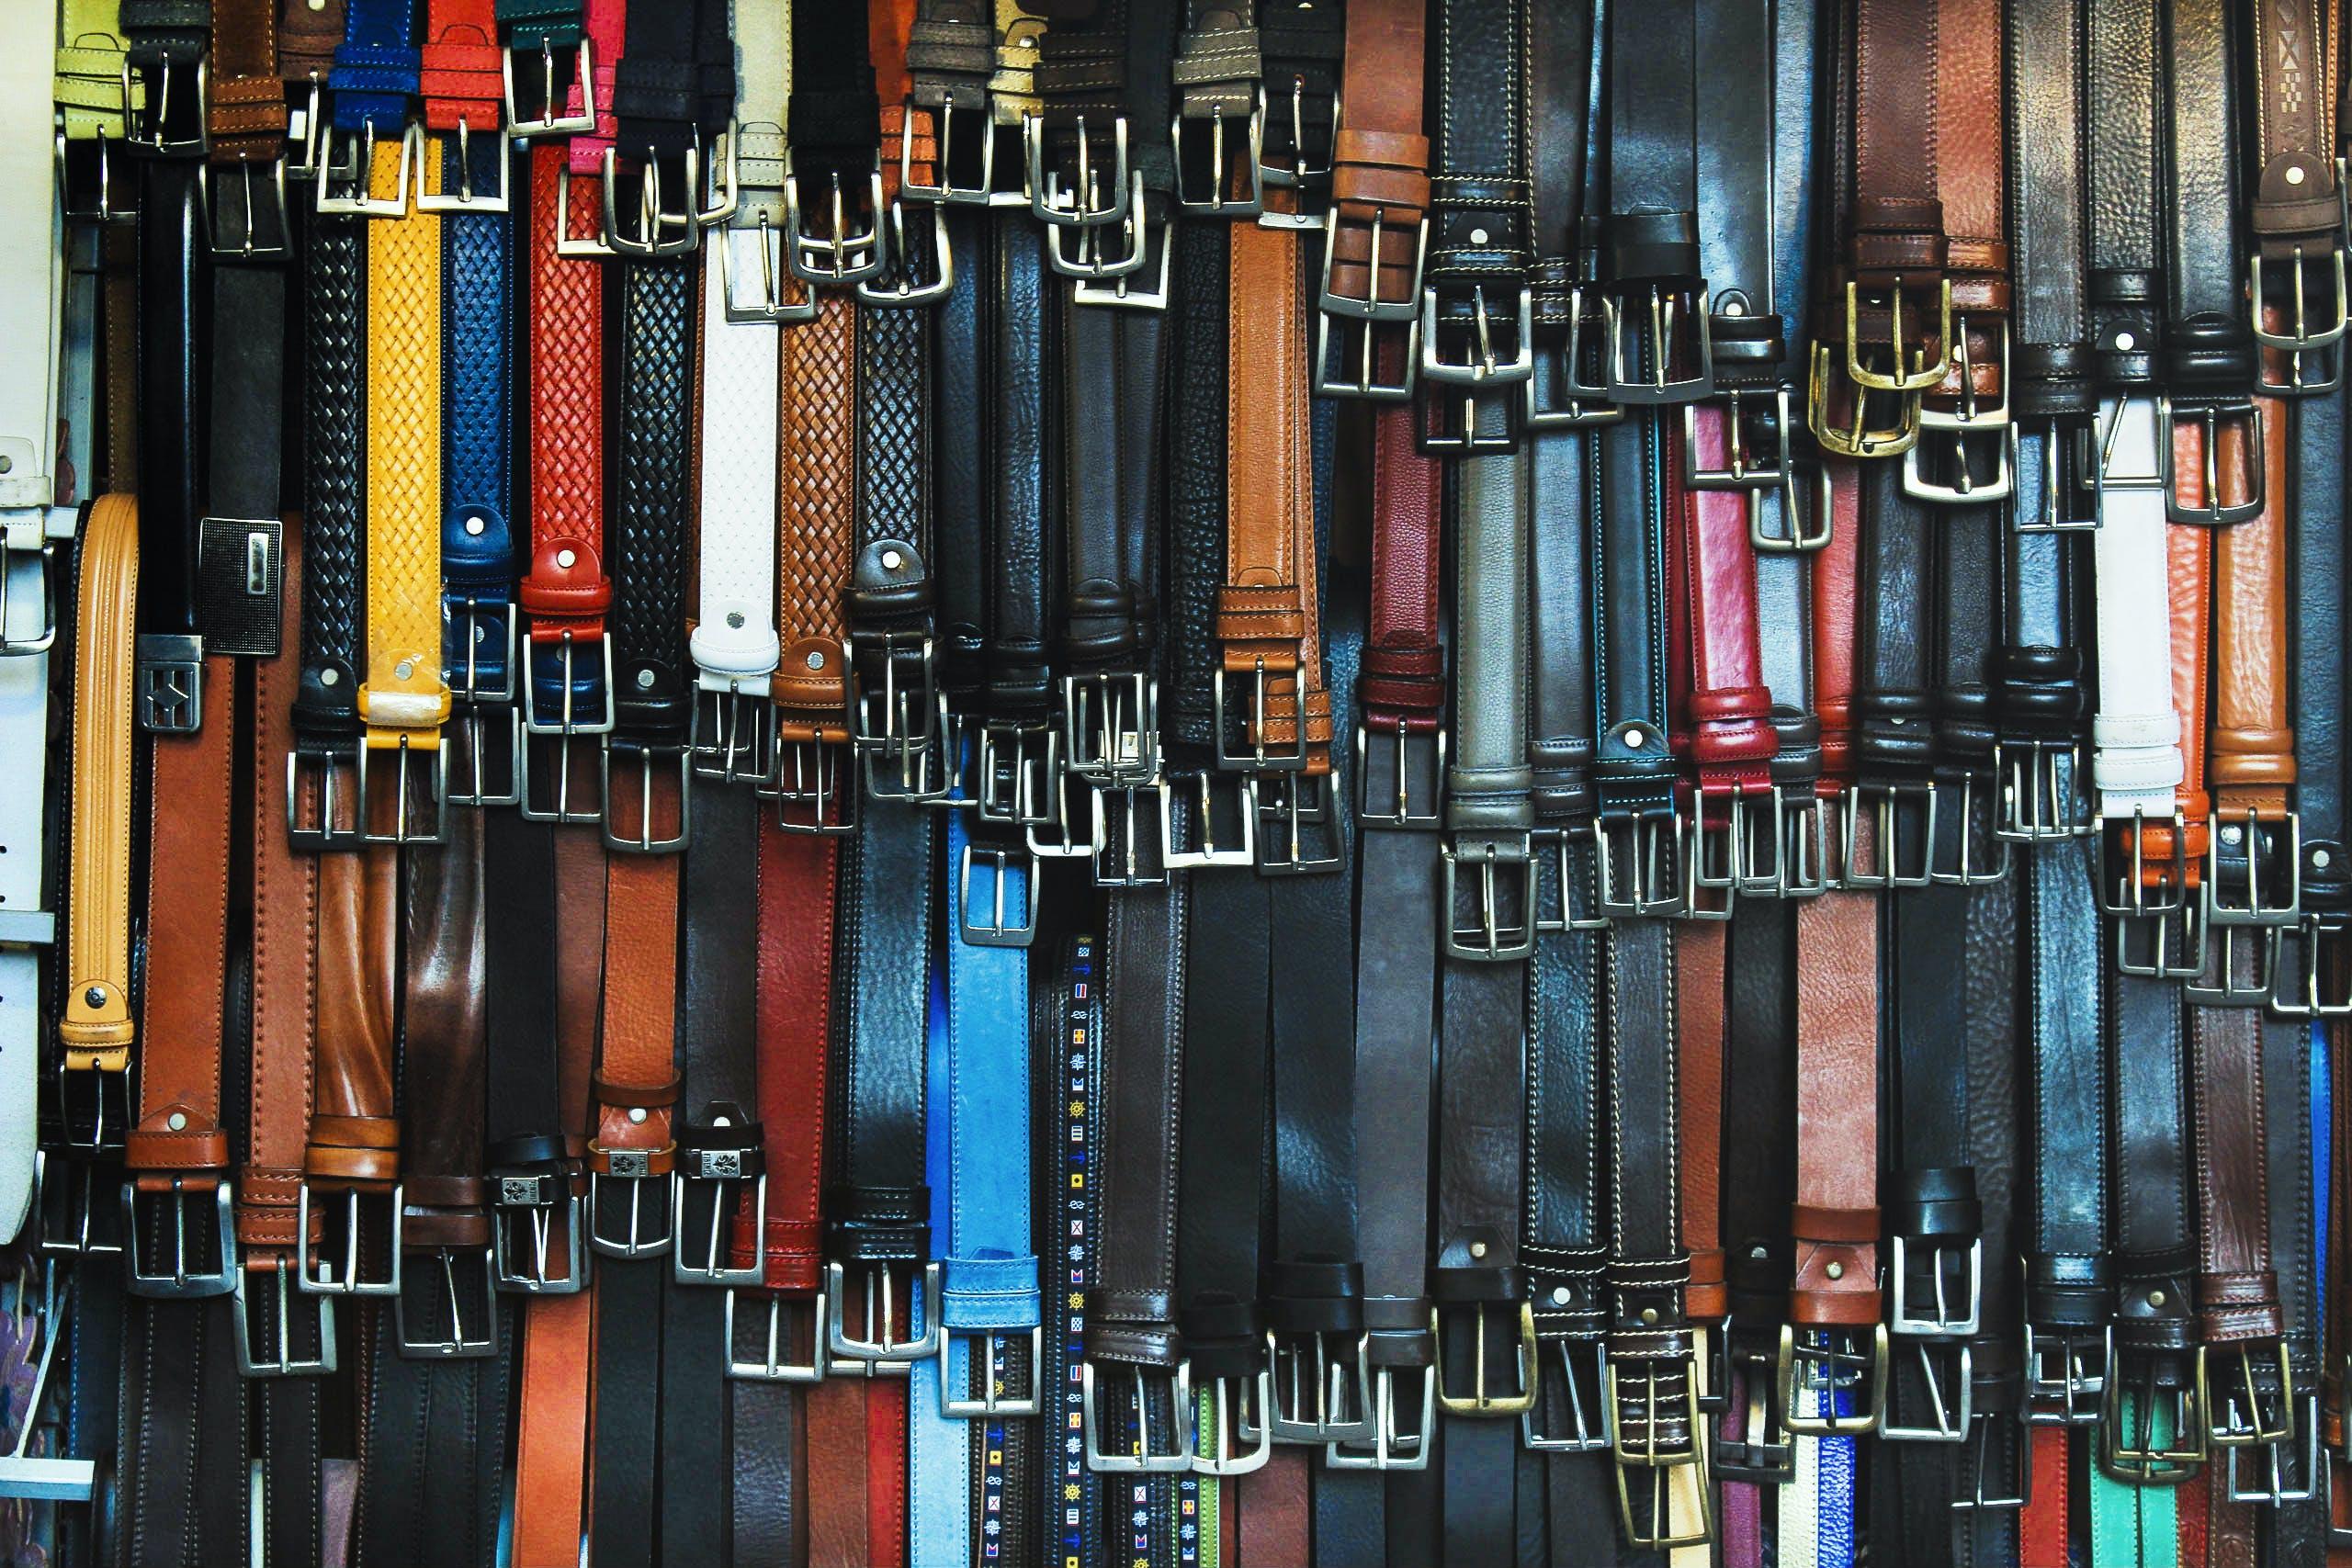 Different belt